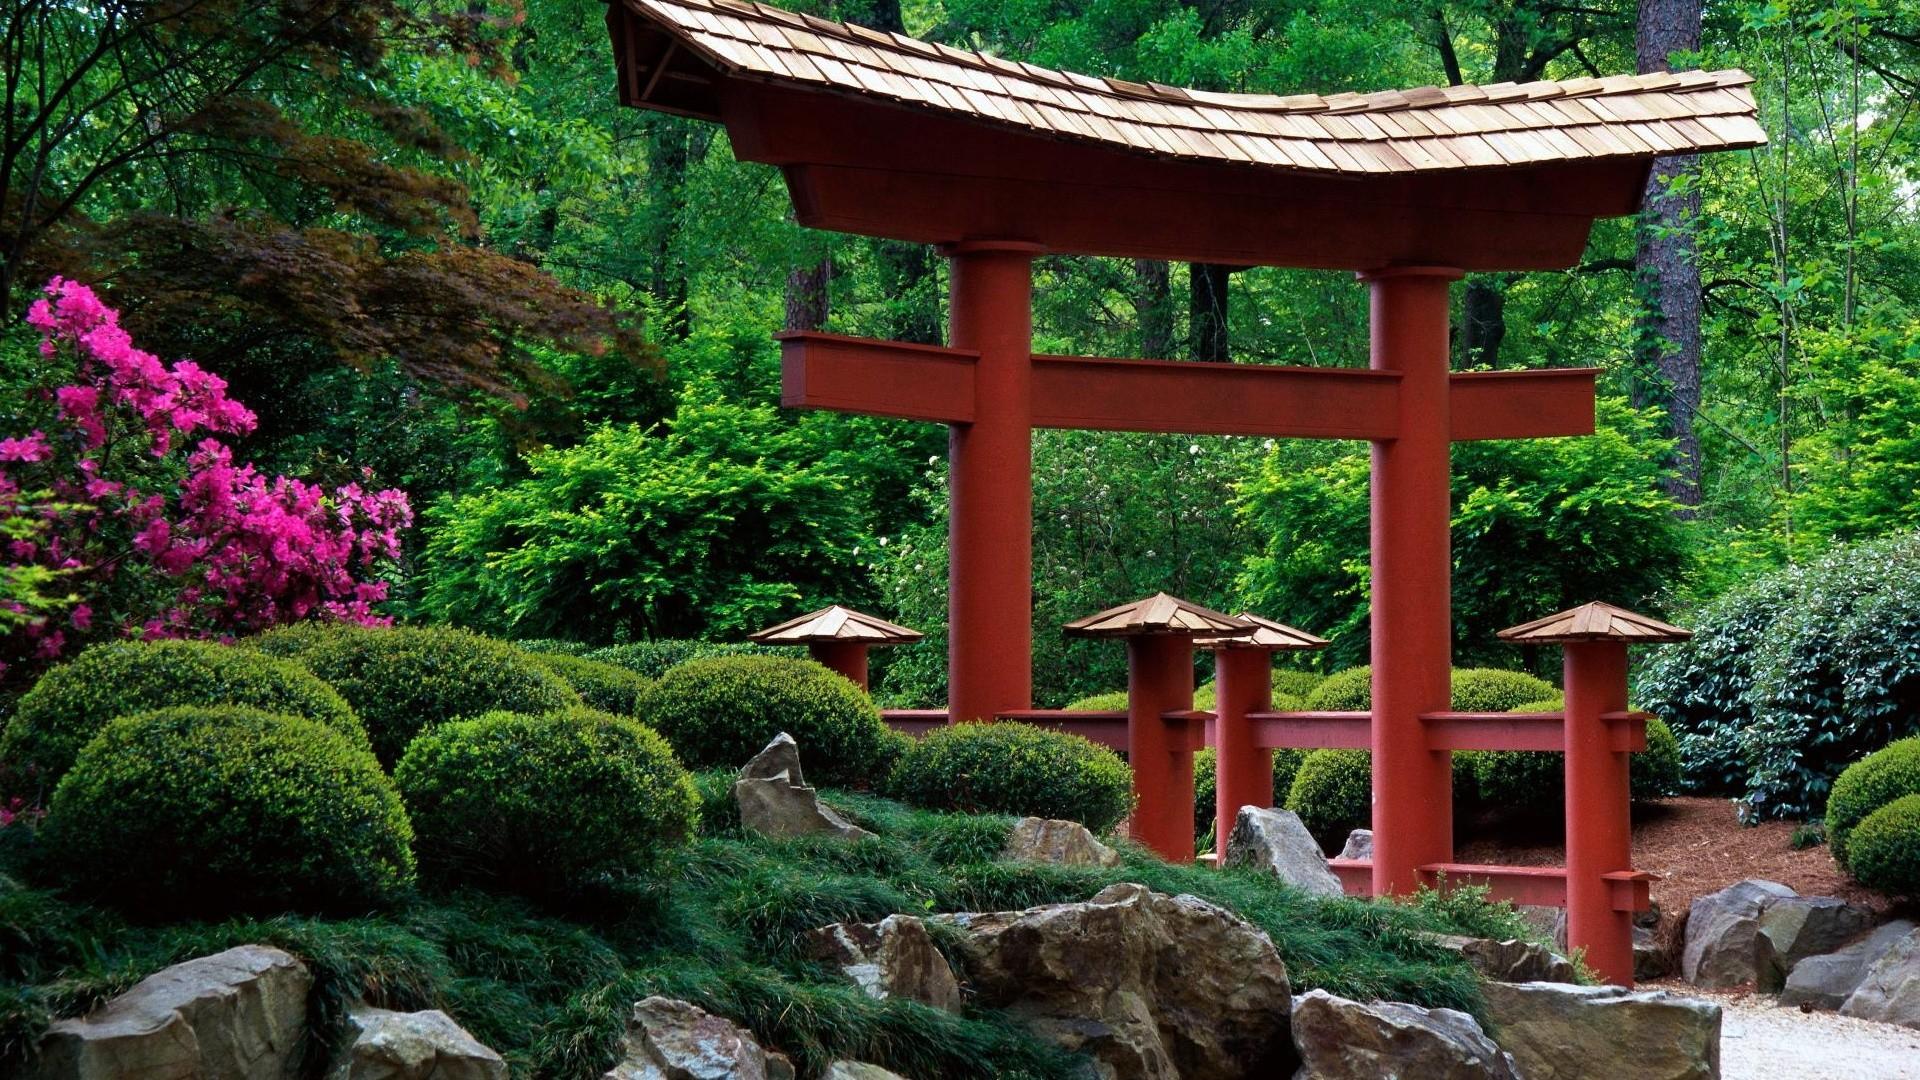 download cool hd amazing japan garden wallpaper